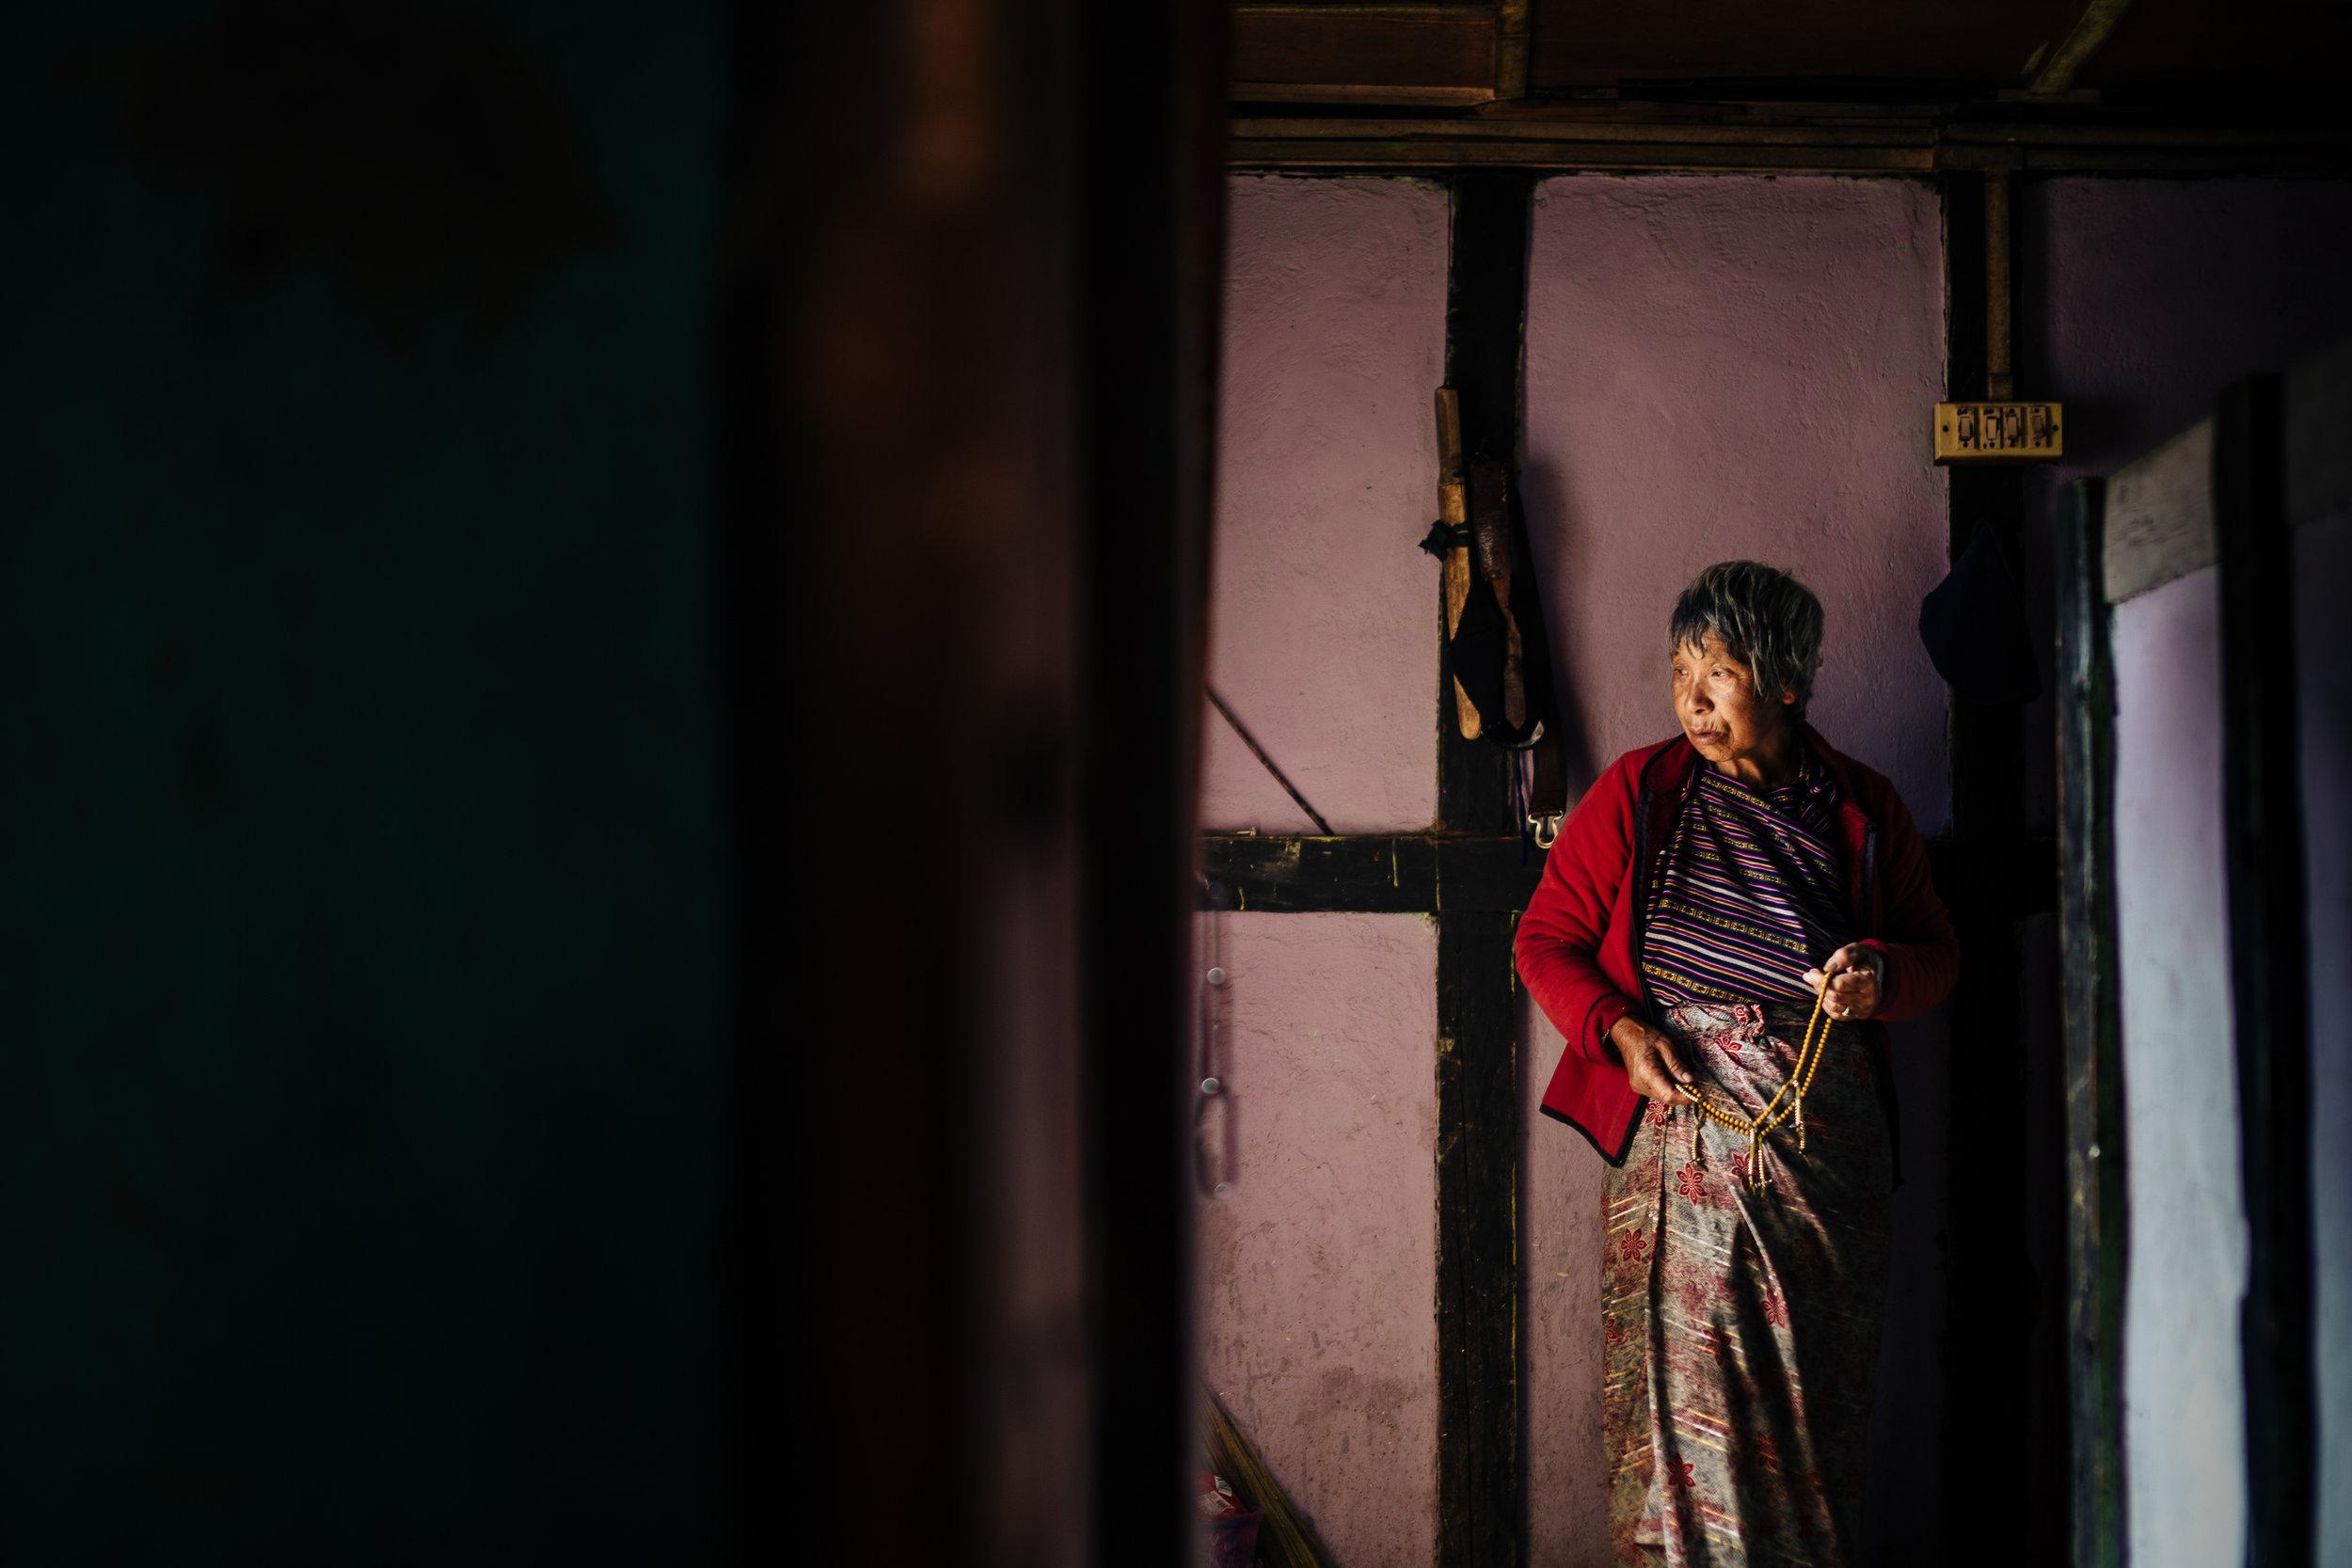 Bhutan-farmhouse-grandma.jpg